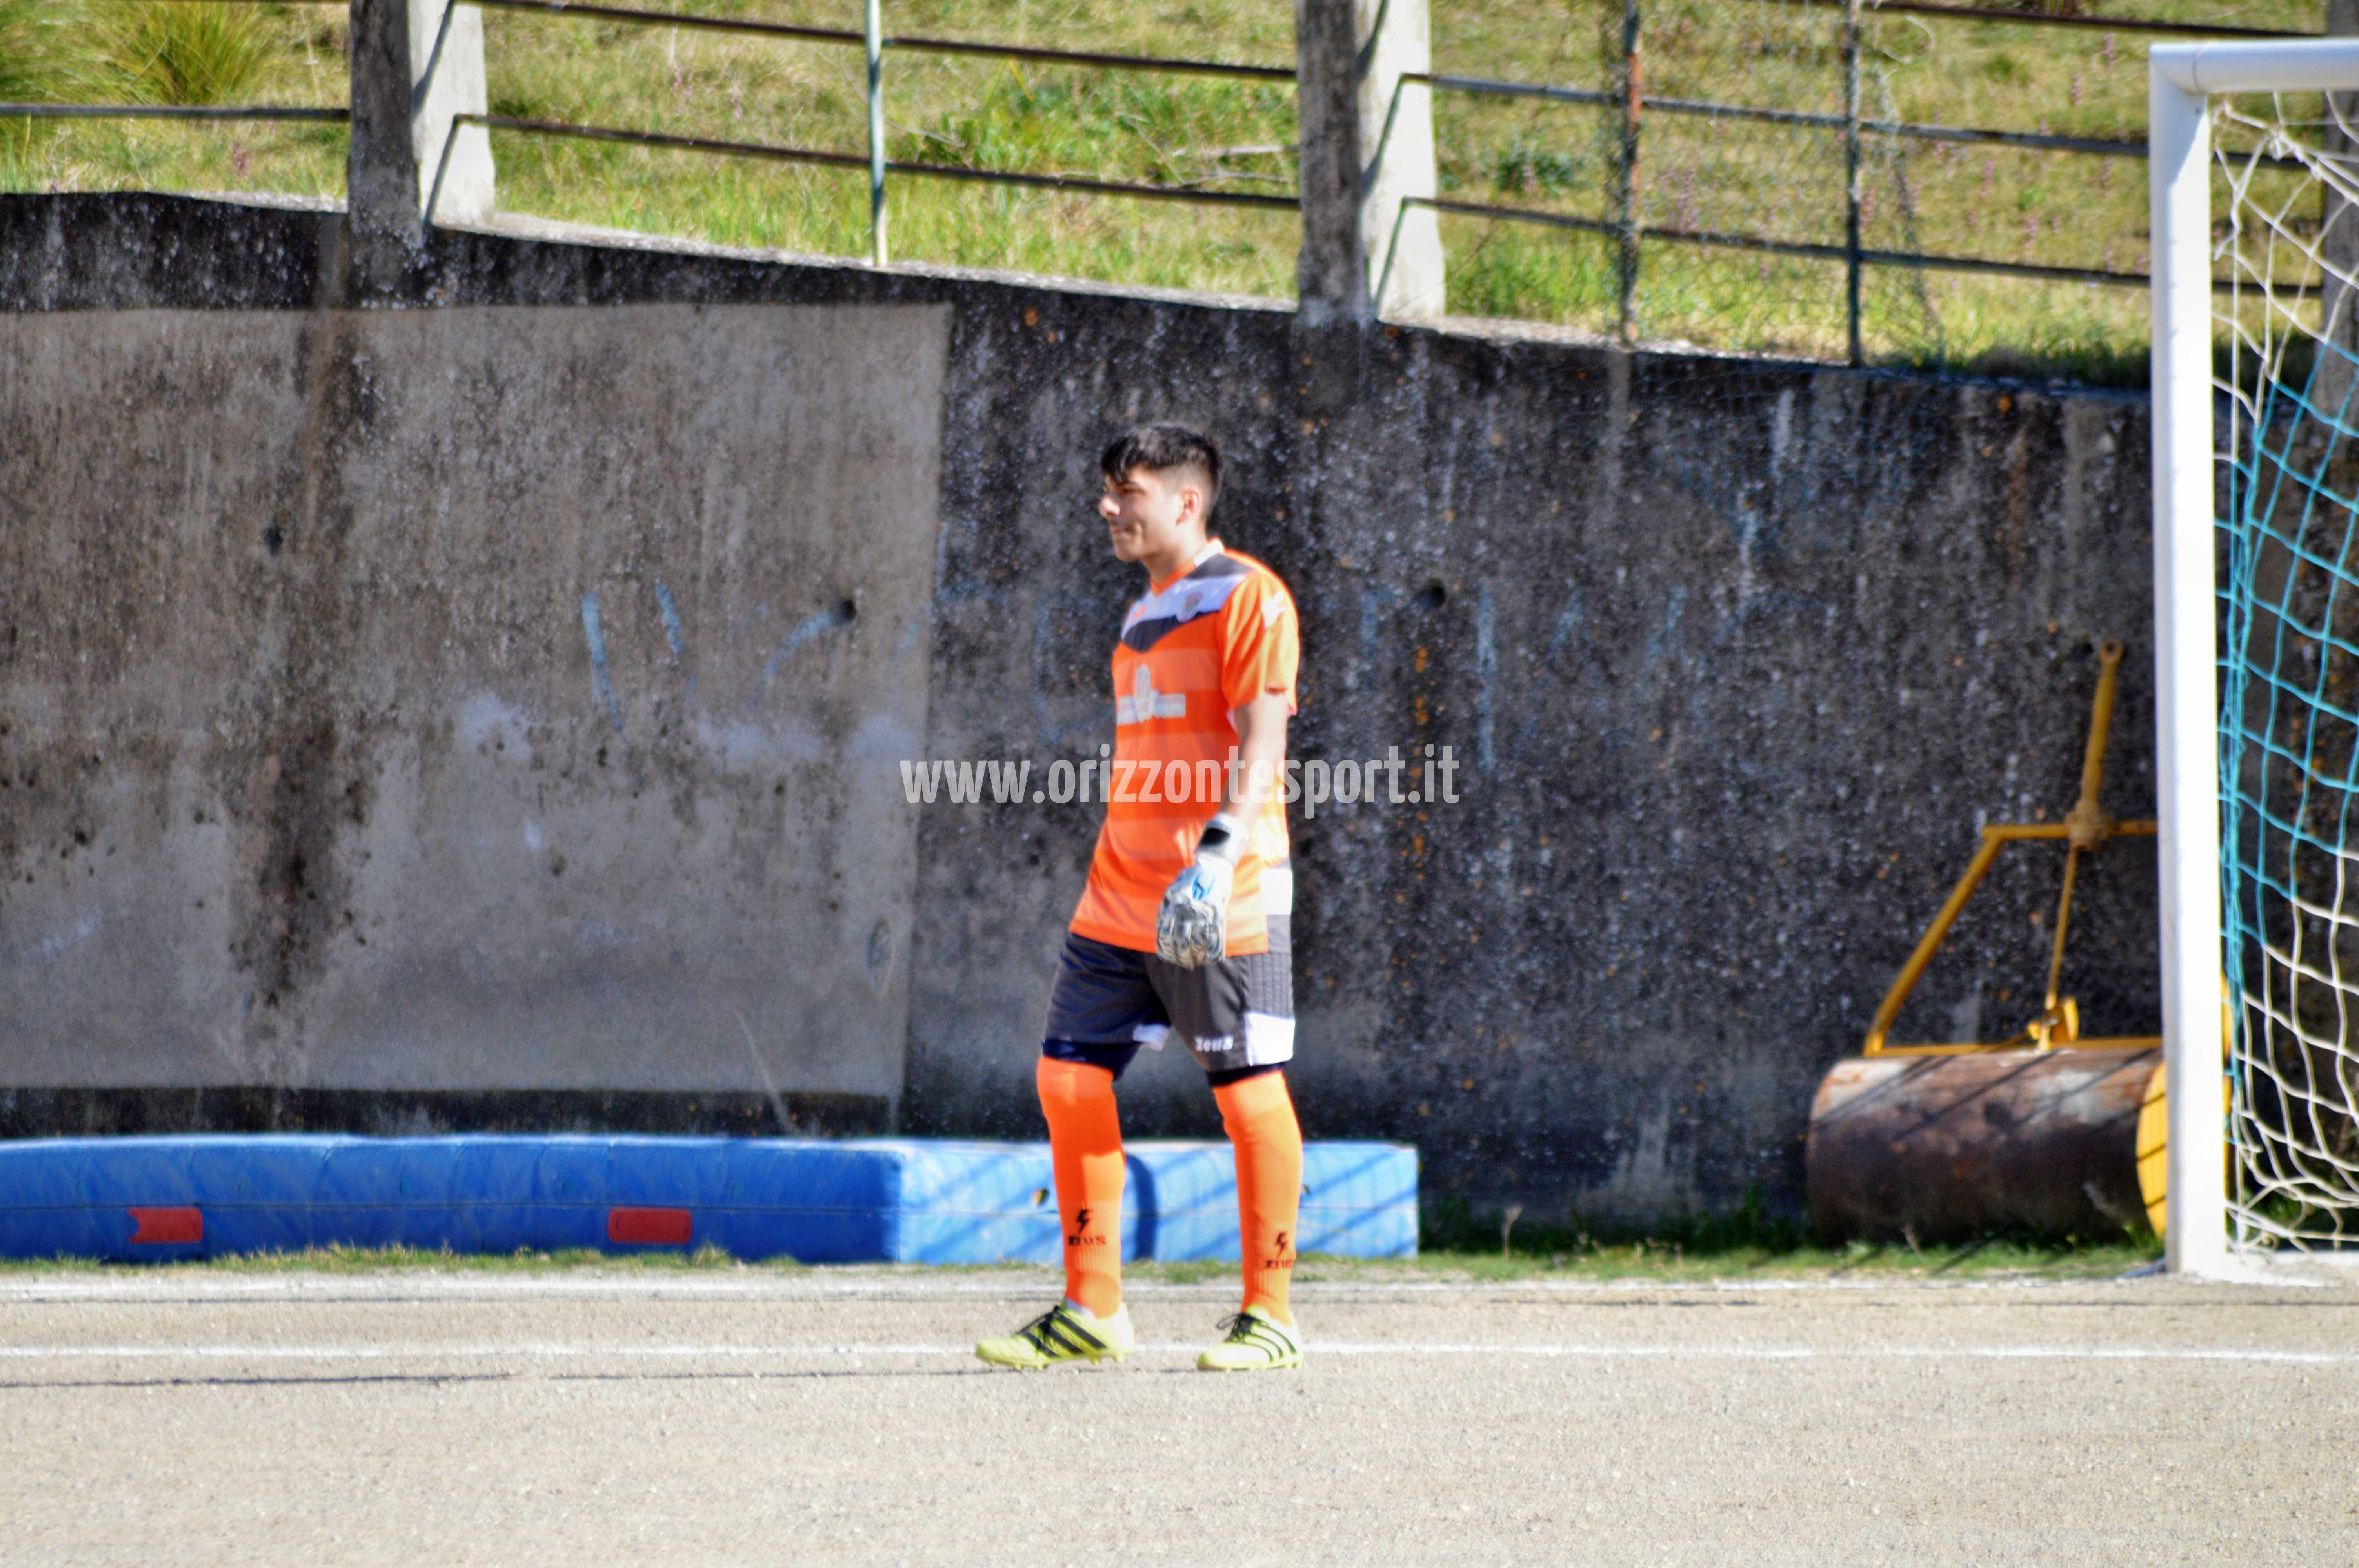 cassano_rossanese (69)